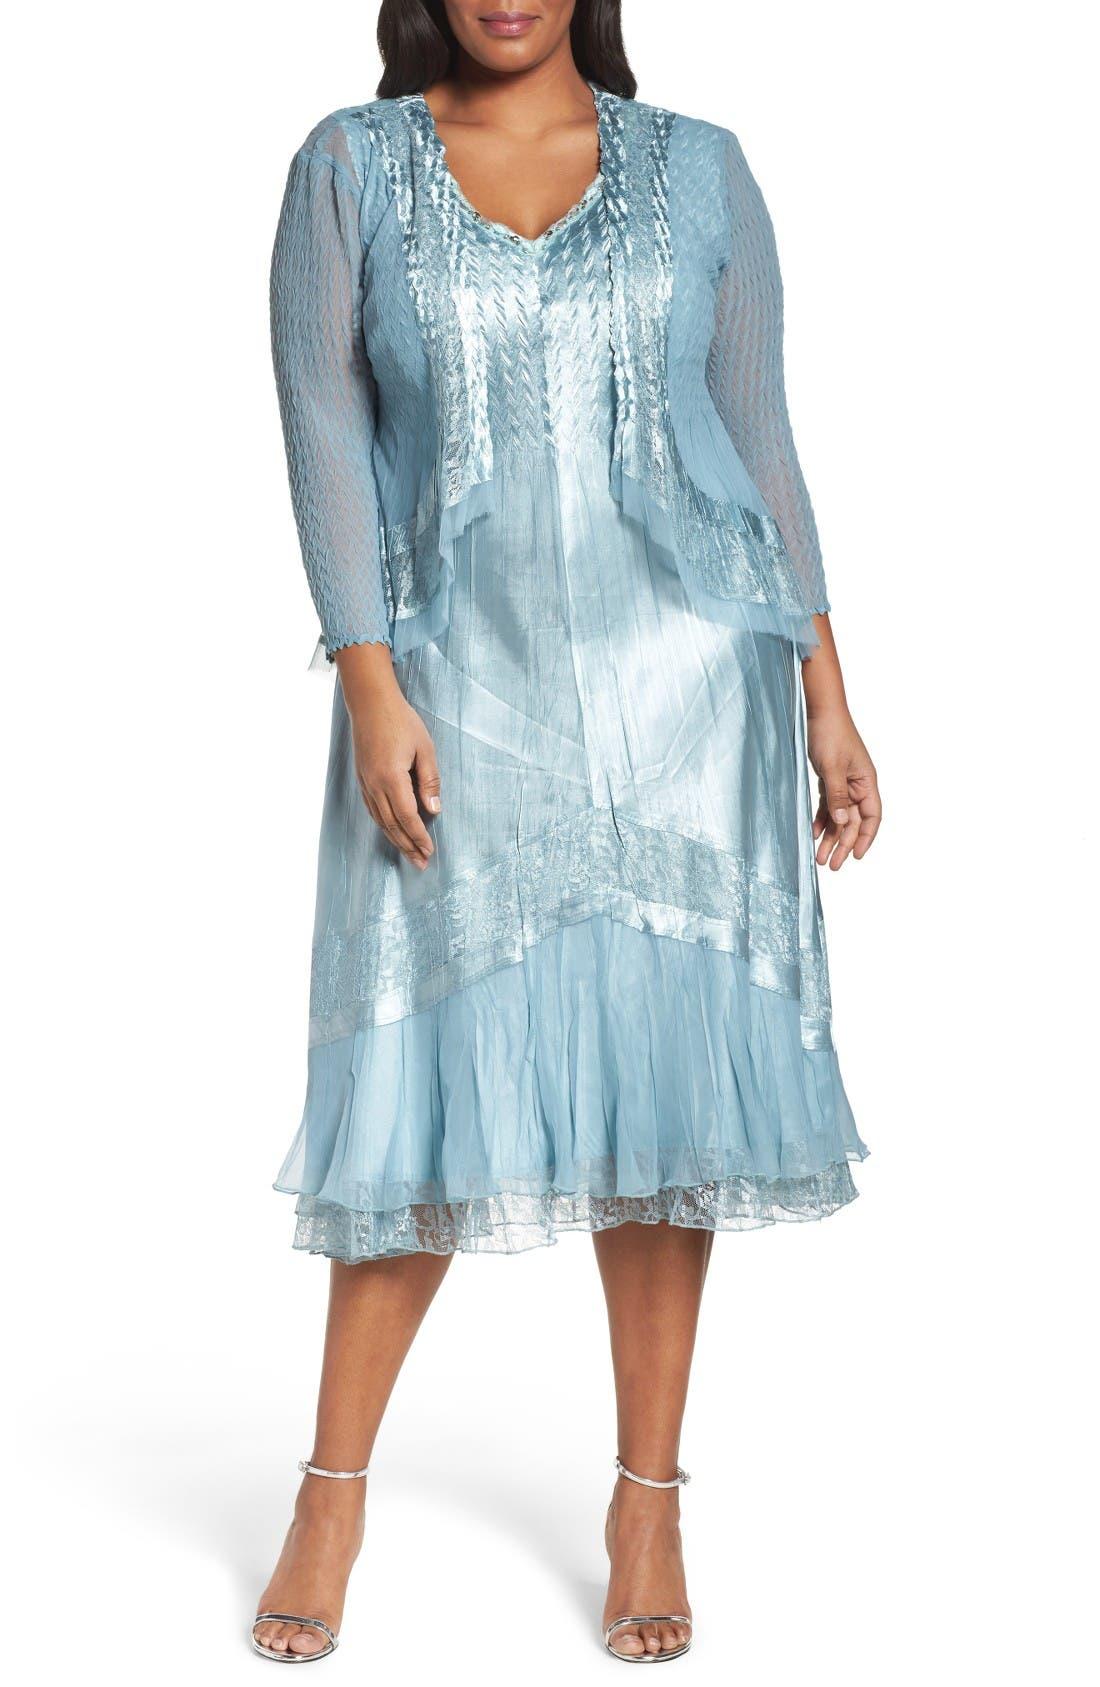 Alternate Image 1 Selected - Komarov Lace Trim Jacket Dress (Plus Size)